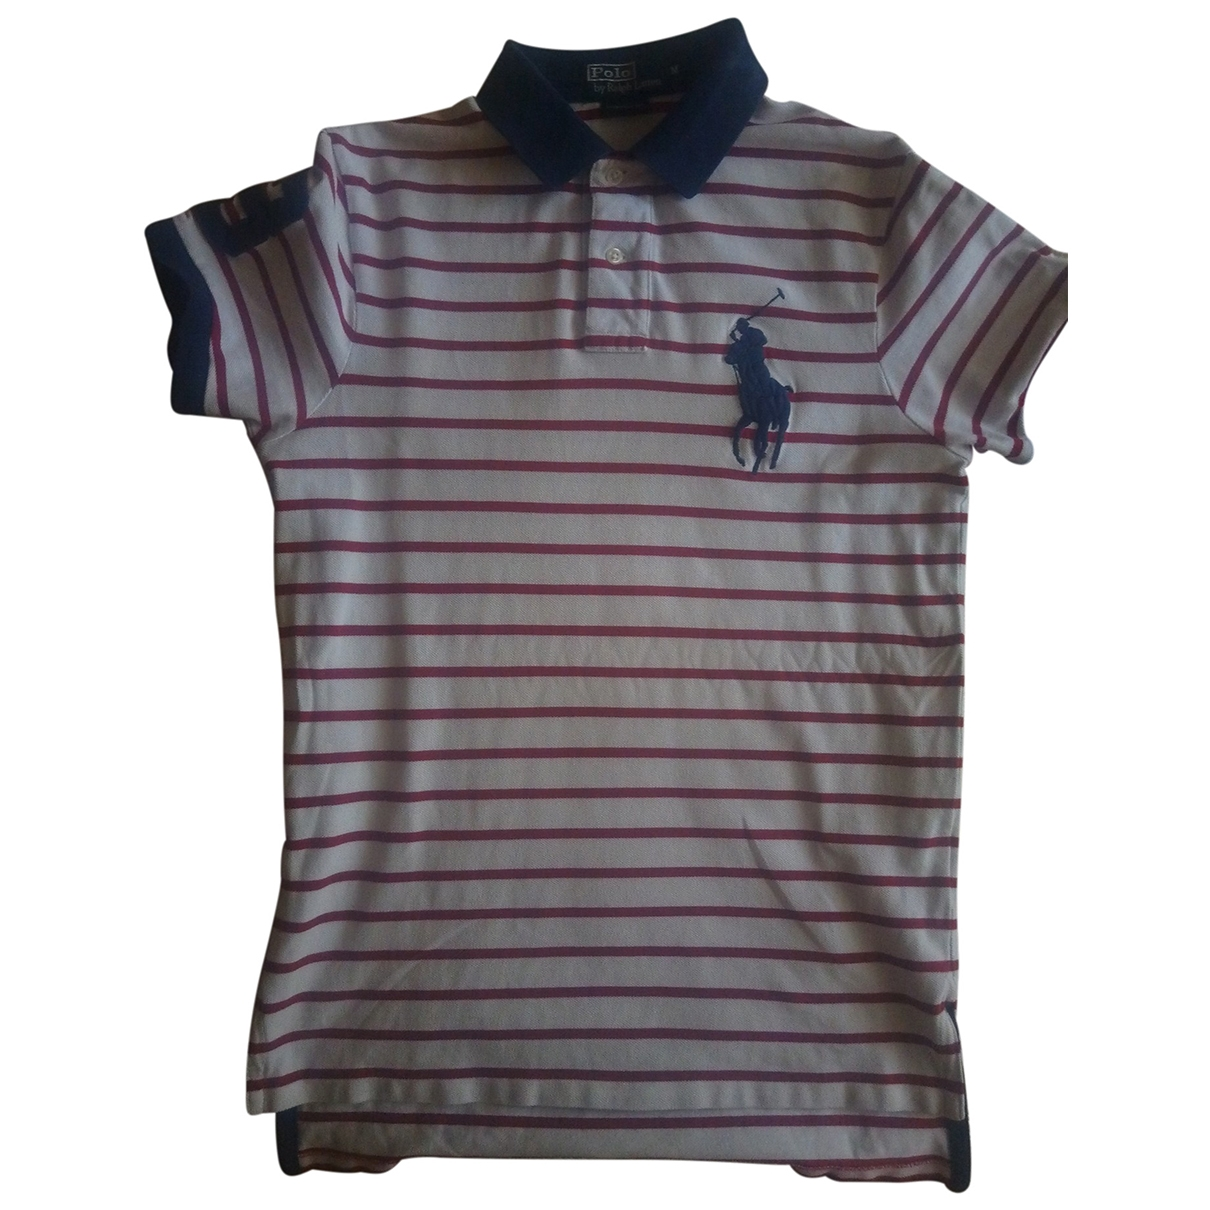 Polo Ralph Lauren - Polos Polo Rugby manches courtes pour homme en coton - blanc